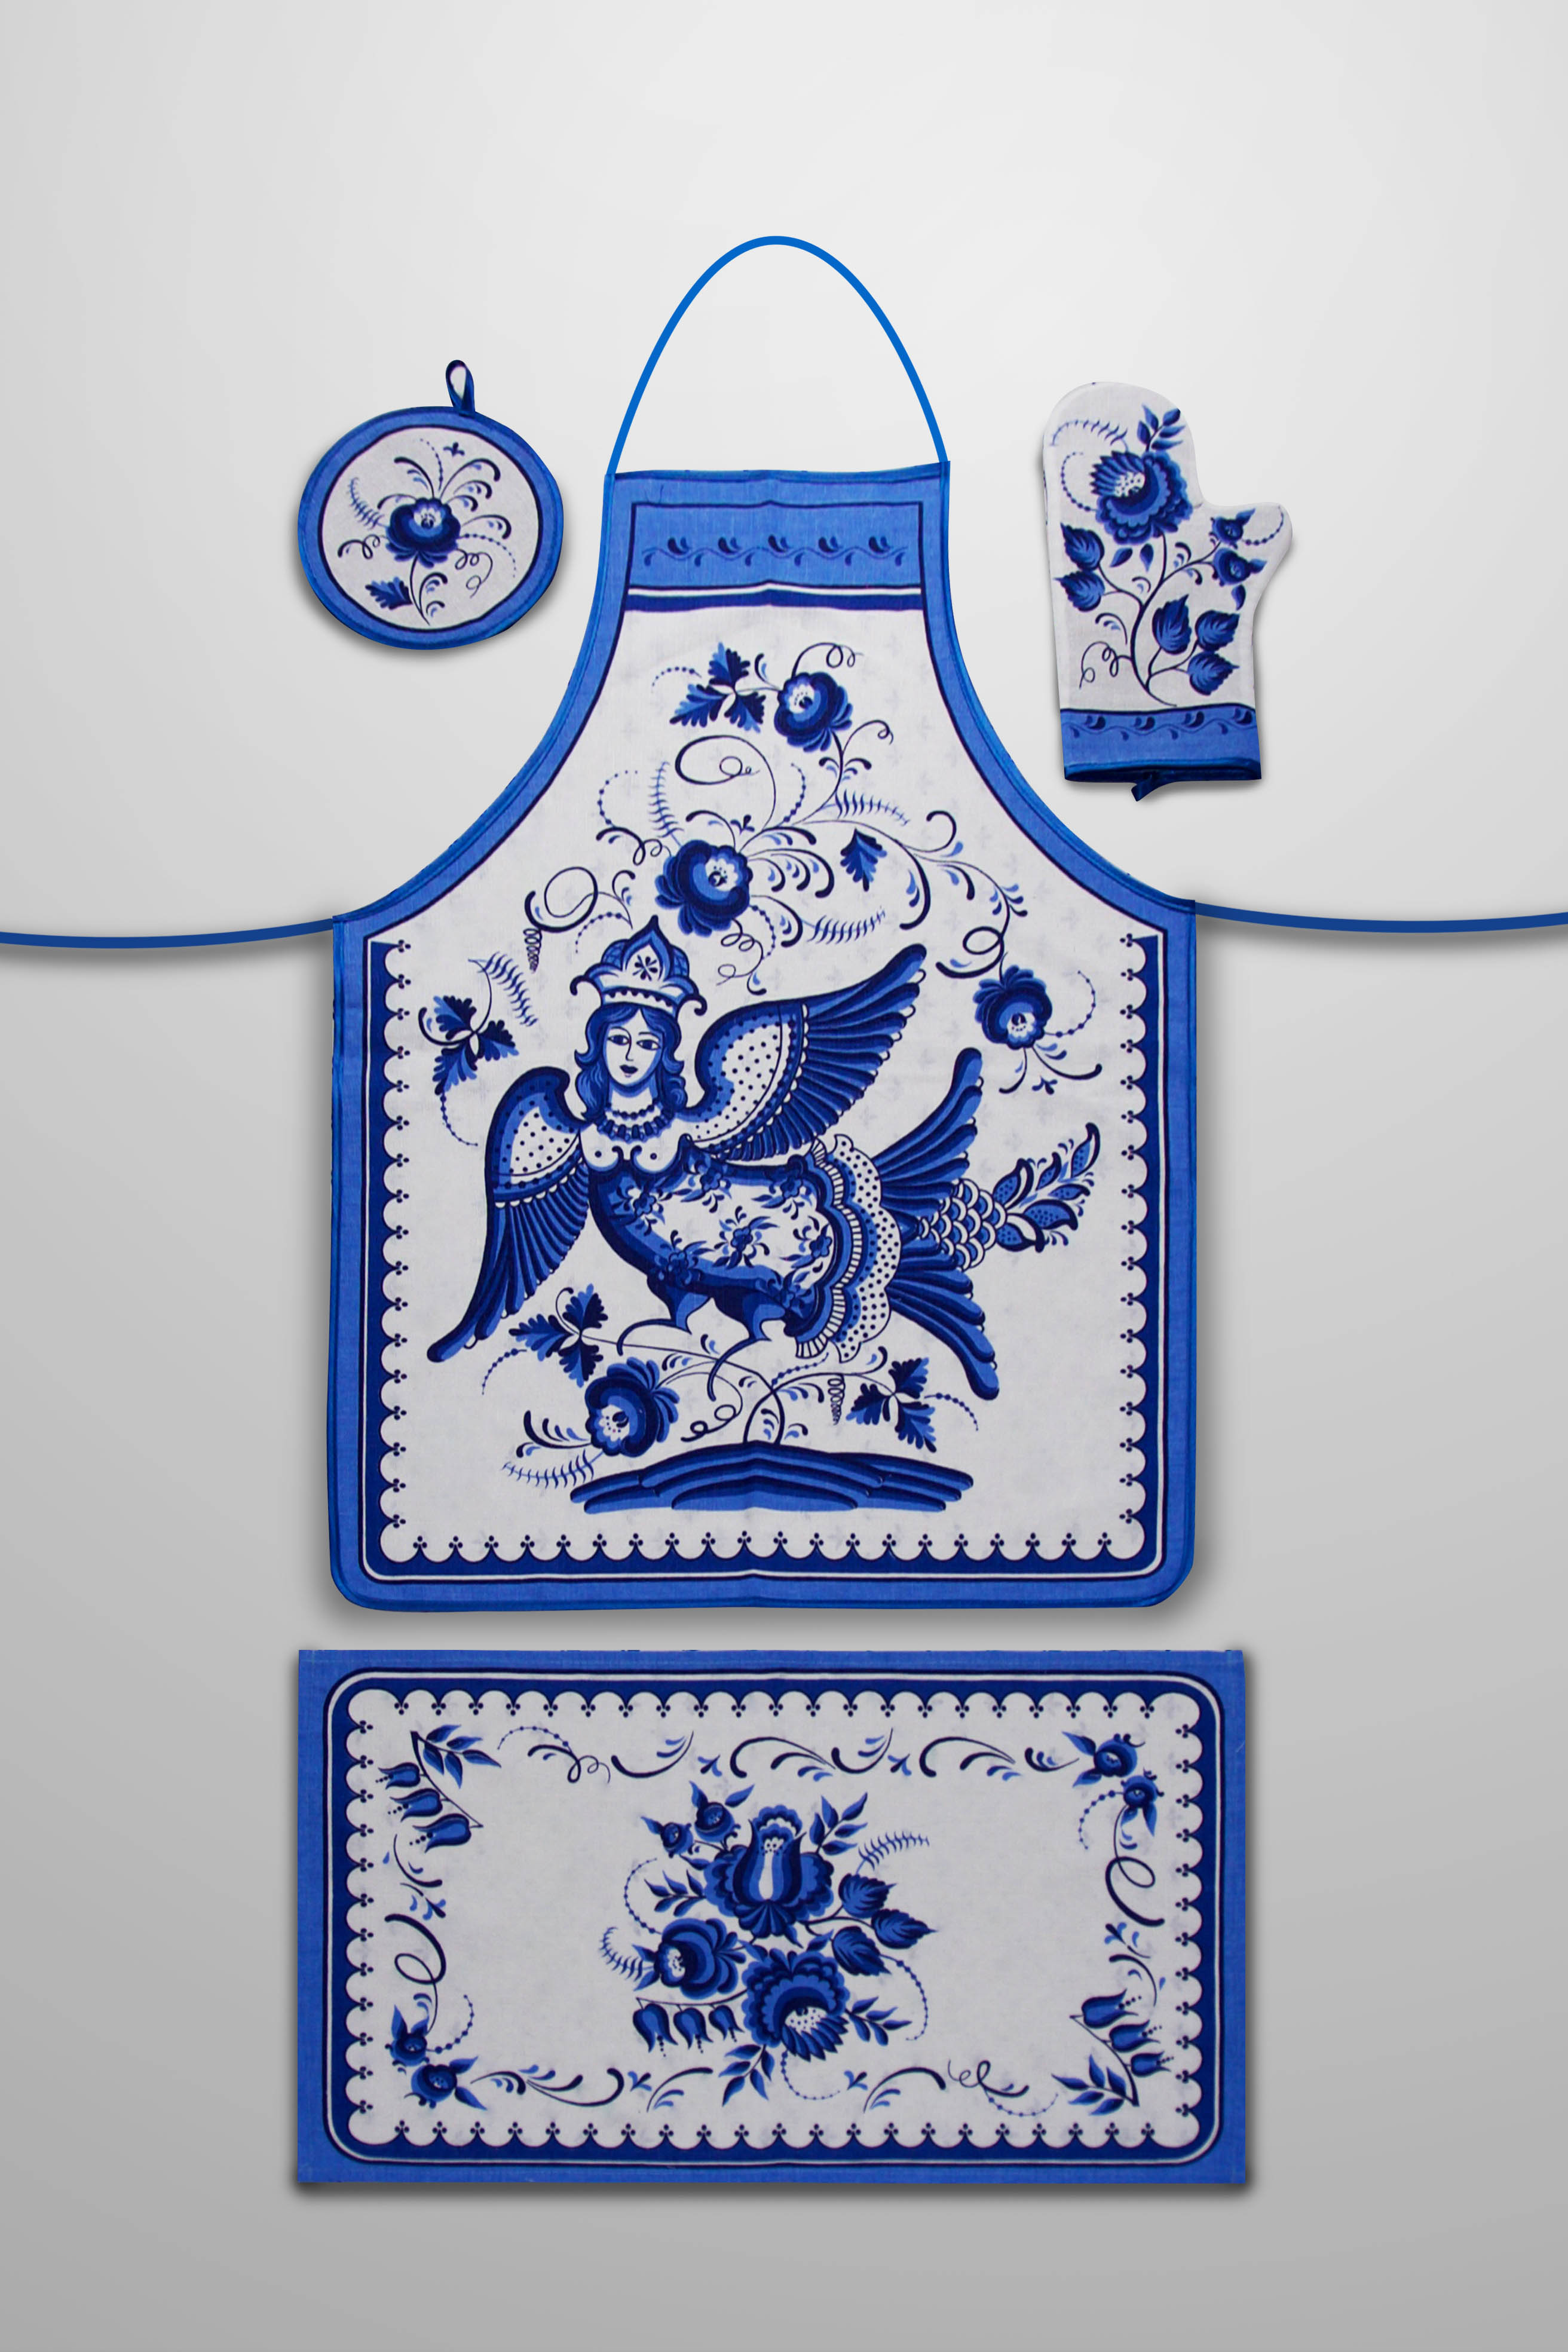 Кухонный набор Zlata Korunka Zlata Korunka Кухонный набор фартук + варежка + прихватка + полотенце Гжель zlk205963